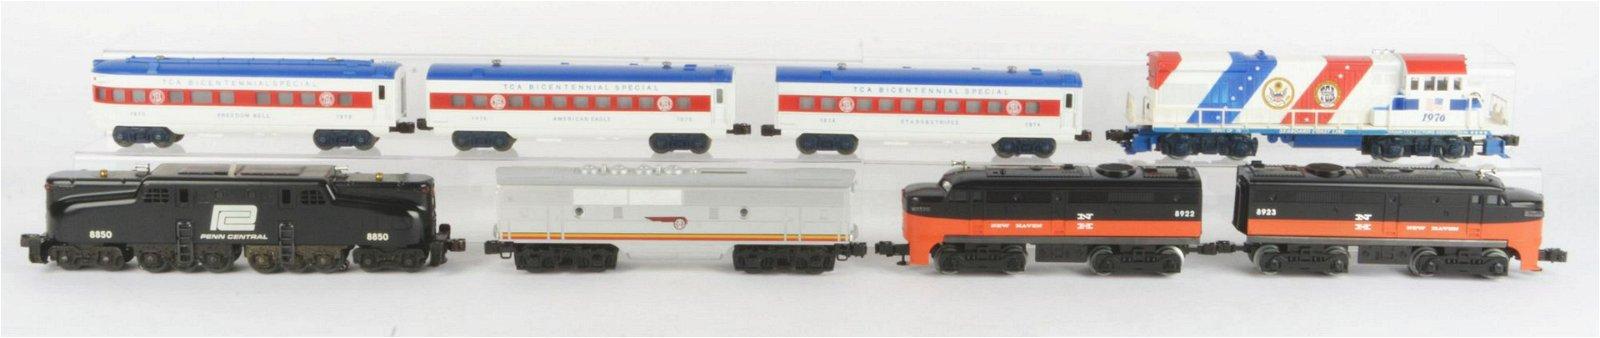 Lionel Modern Era Lionel Train Cars Including Liberty